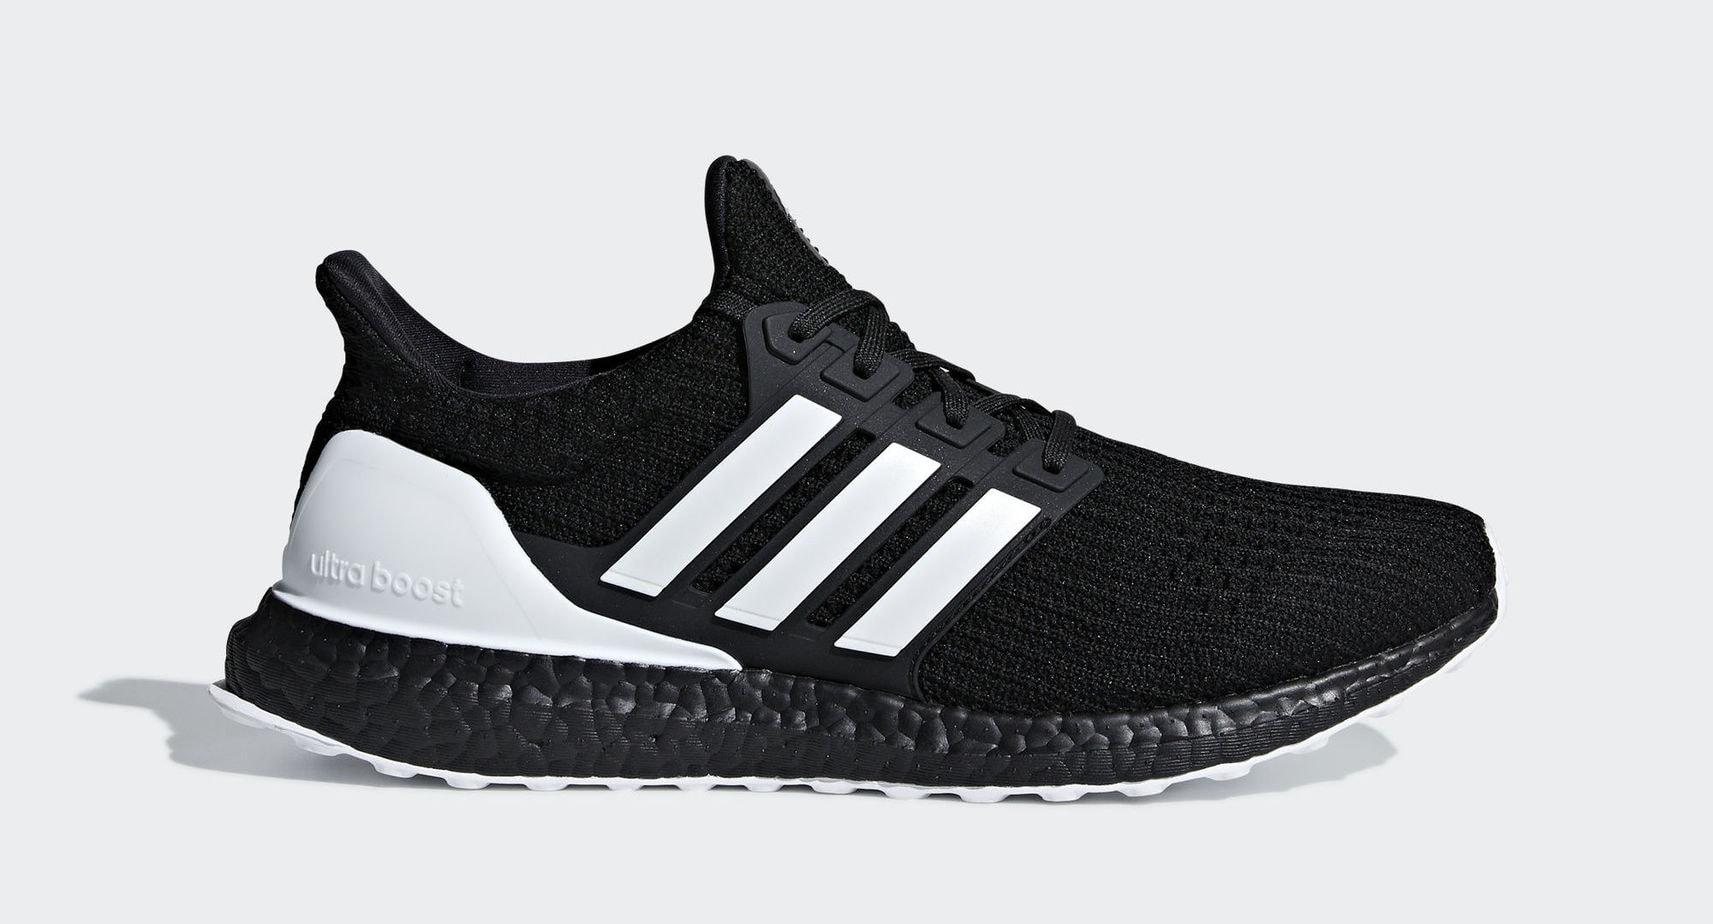 3899b0df1e47b ... promo code for adidas ultra boost 4.0 dna black white core black ftwr  white carbon november